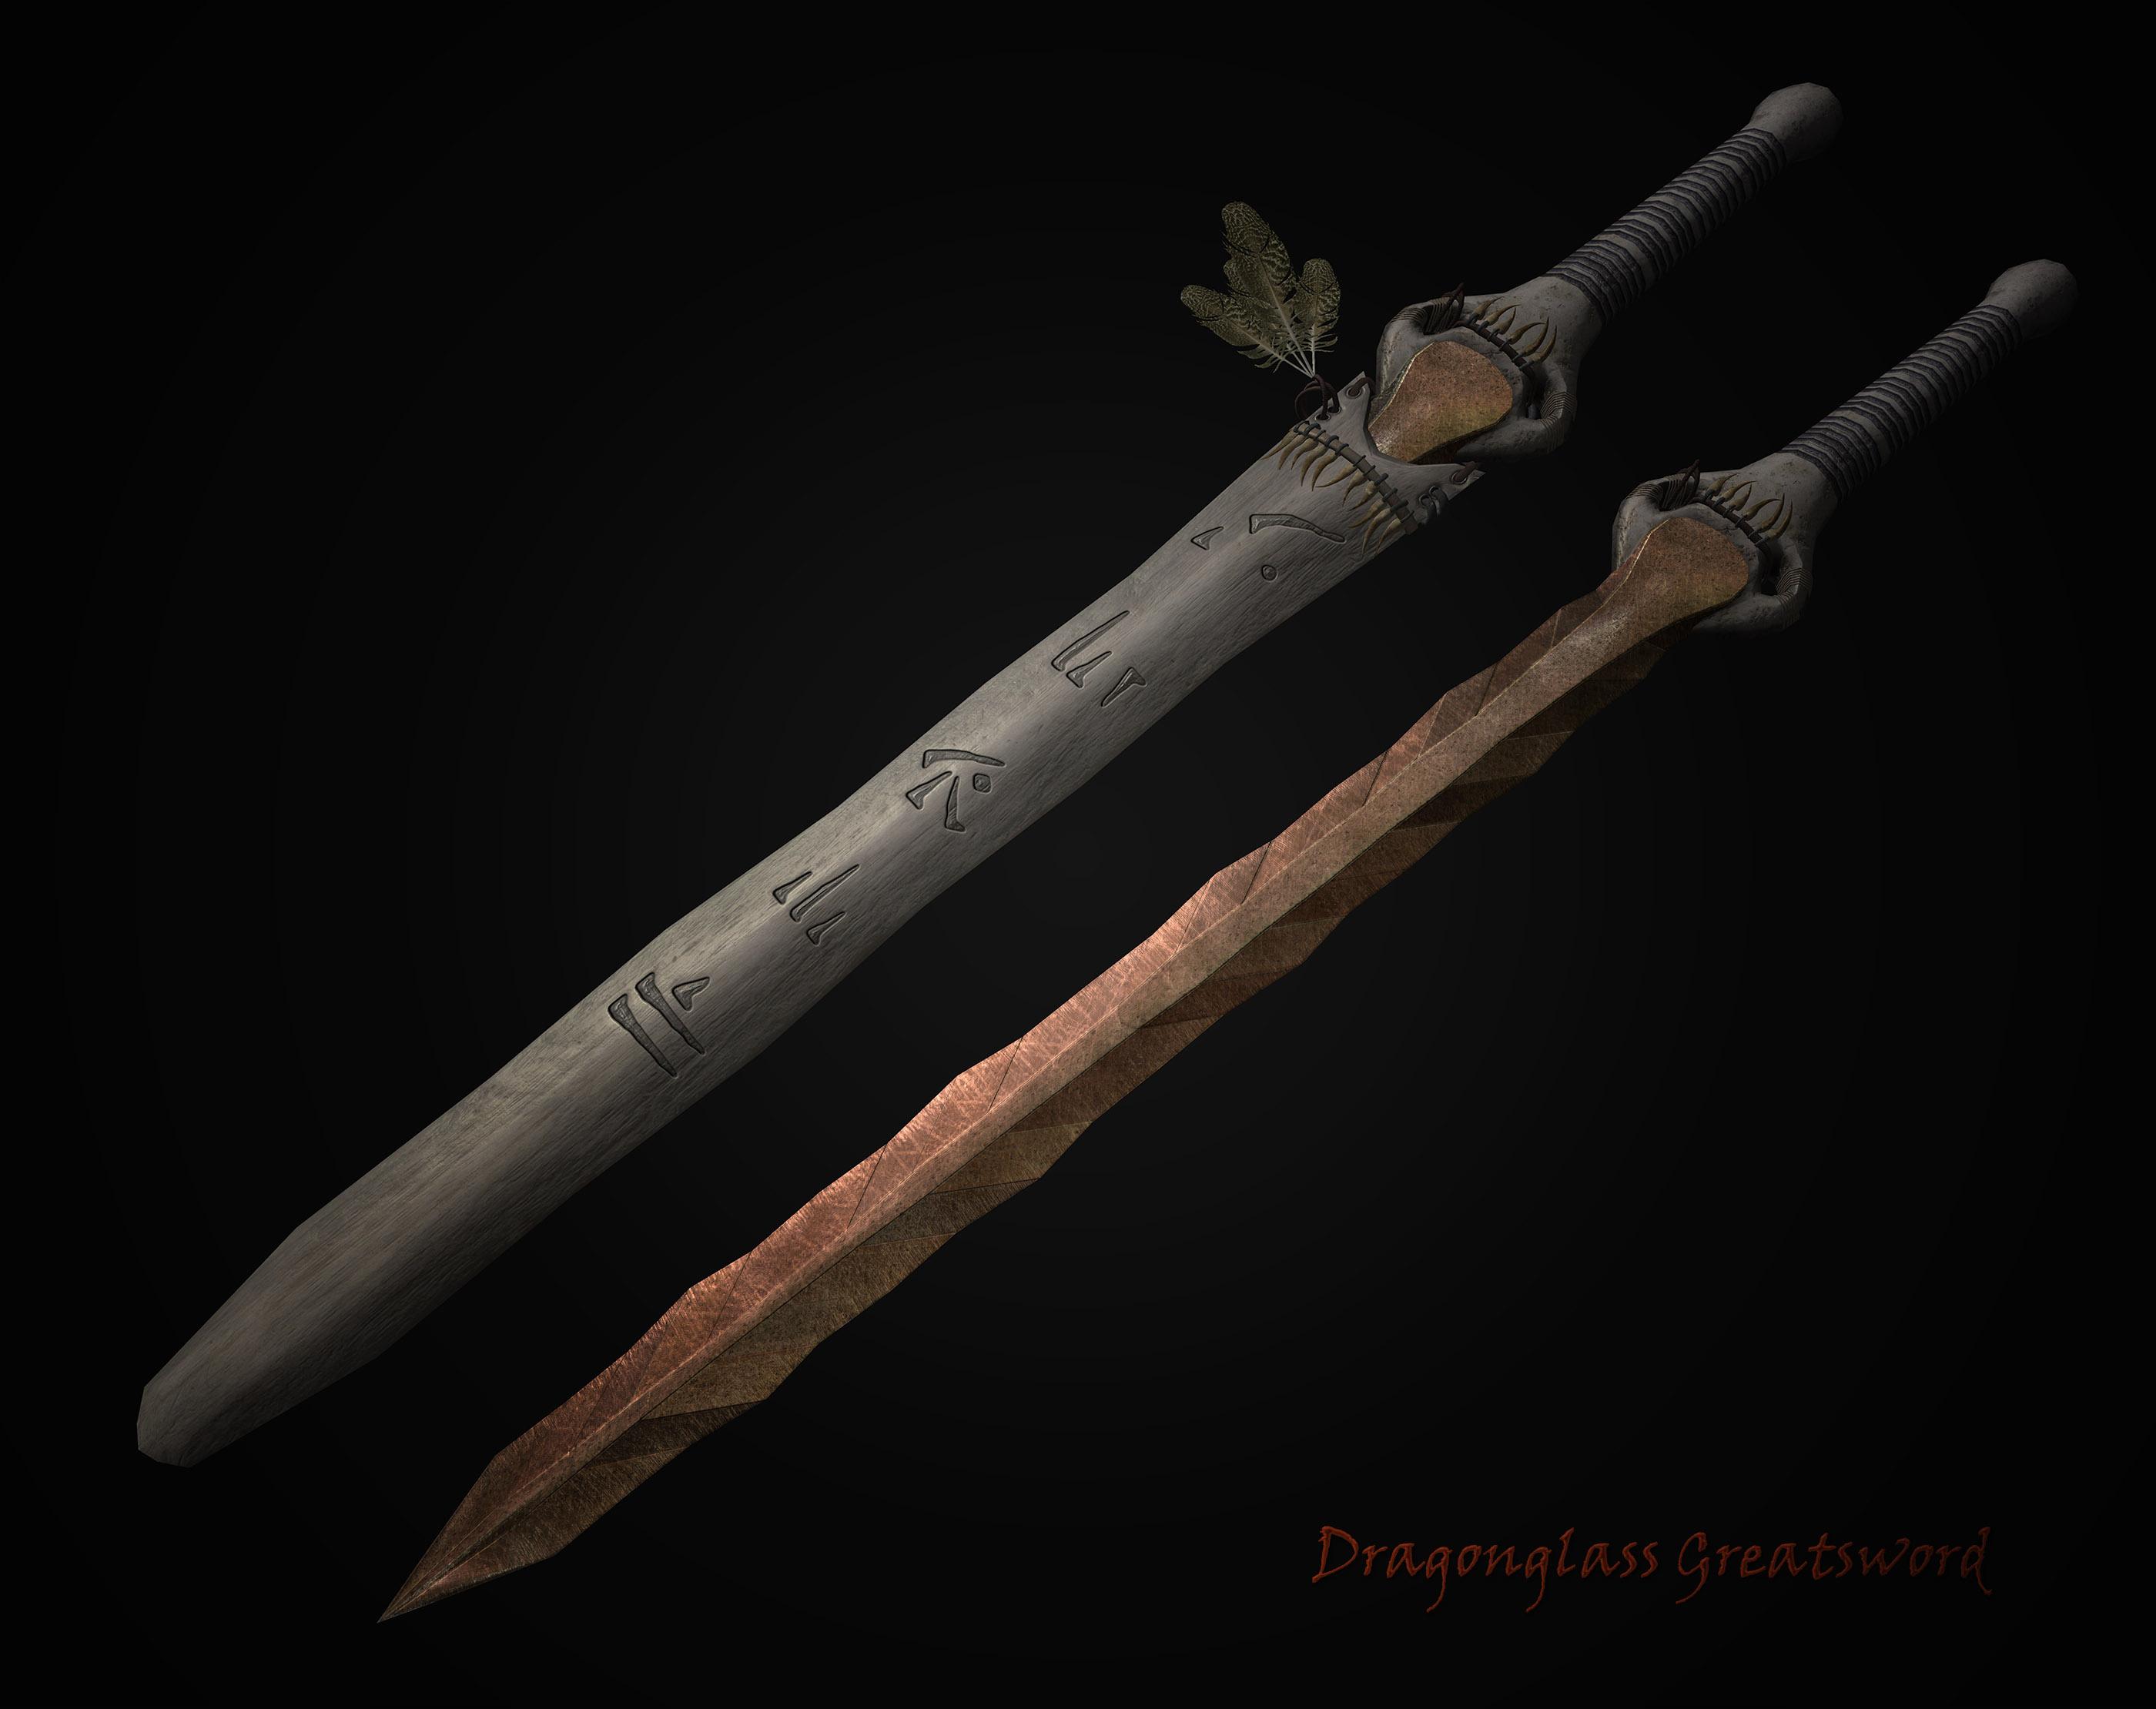 Dragonglass Armory